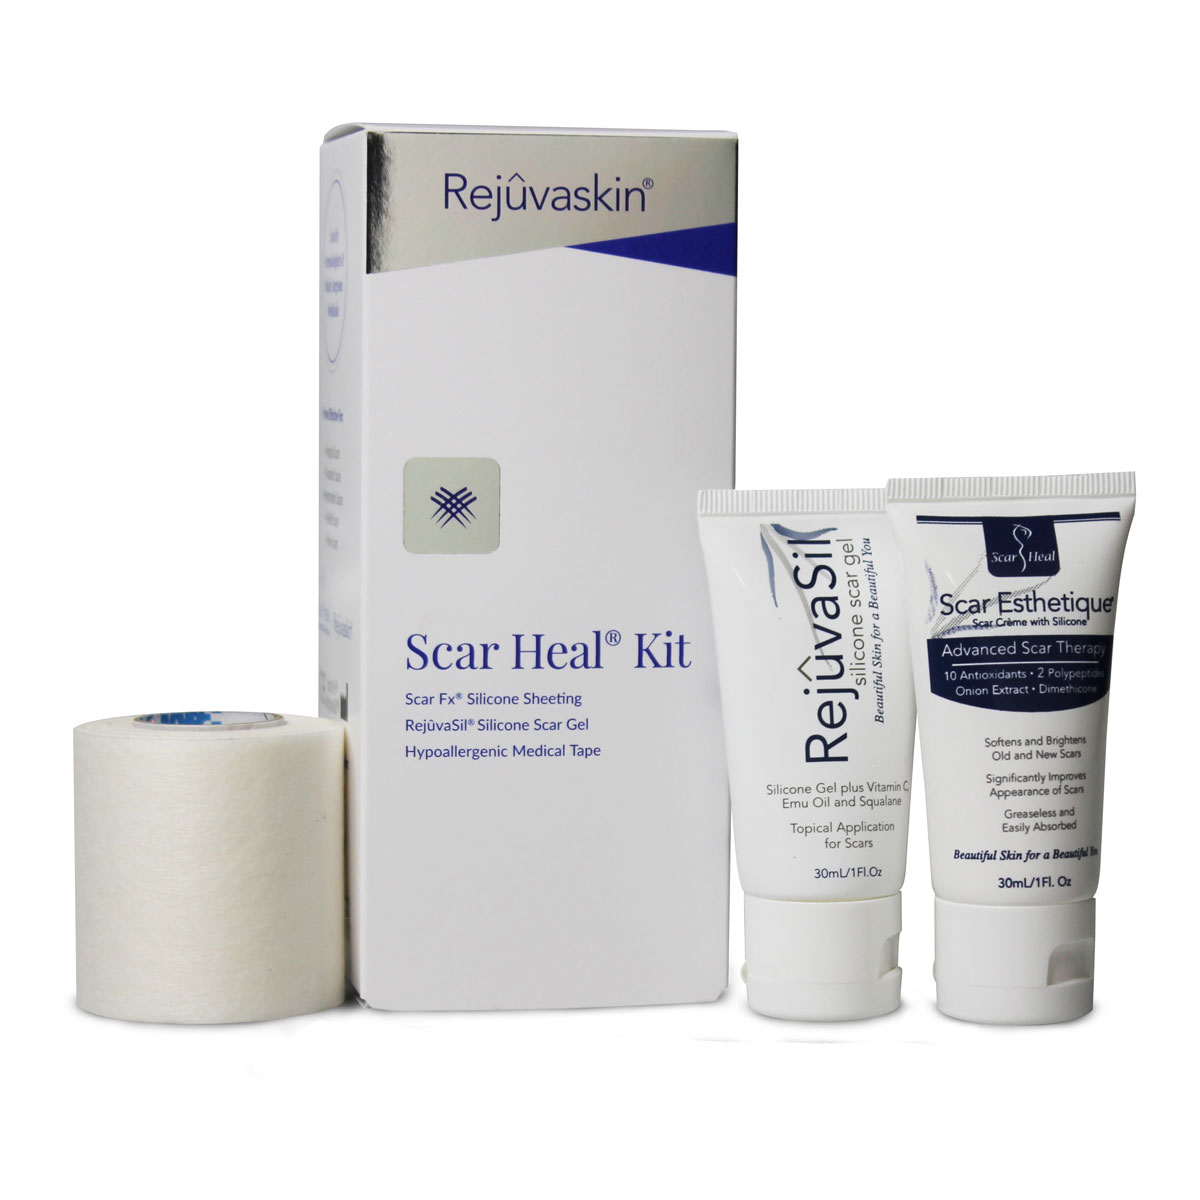 Scar Heal® Kit